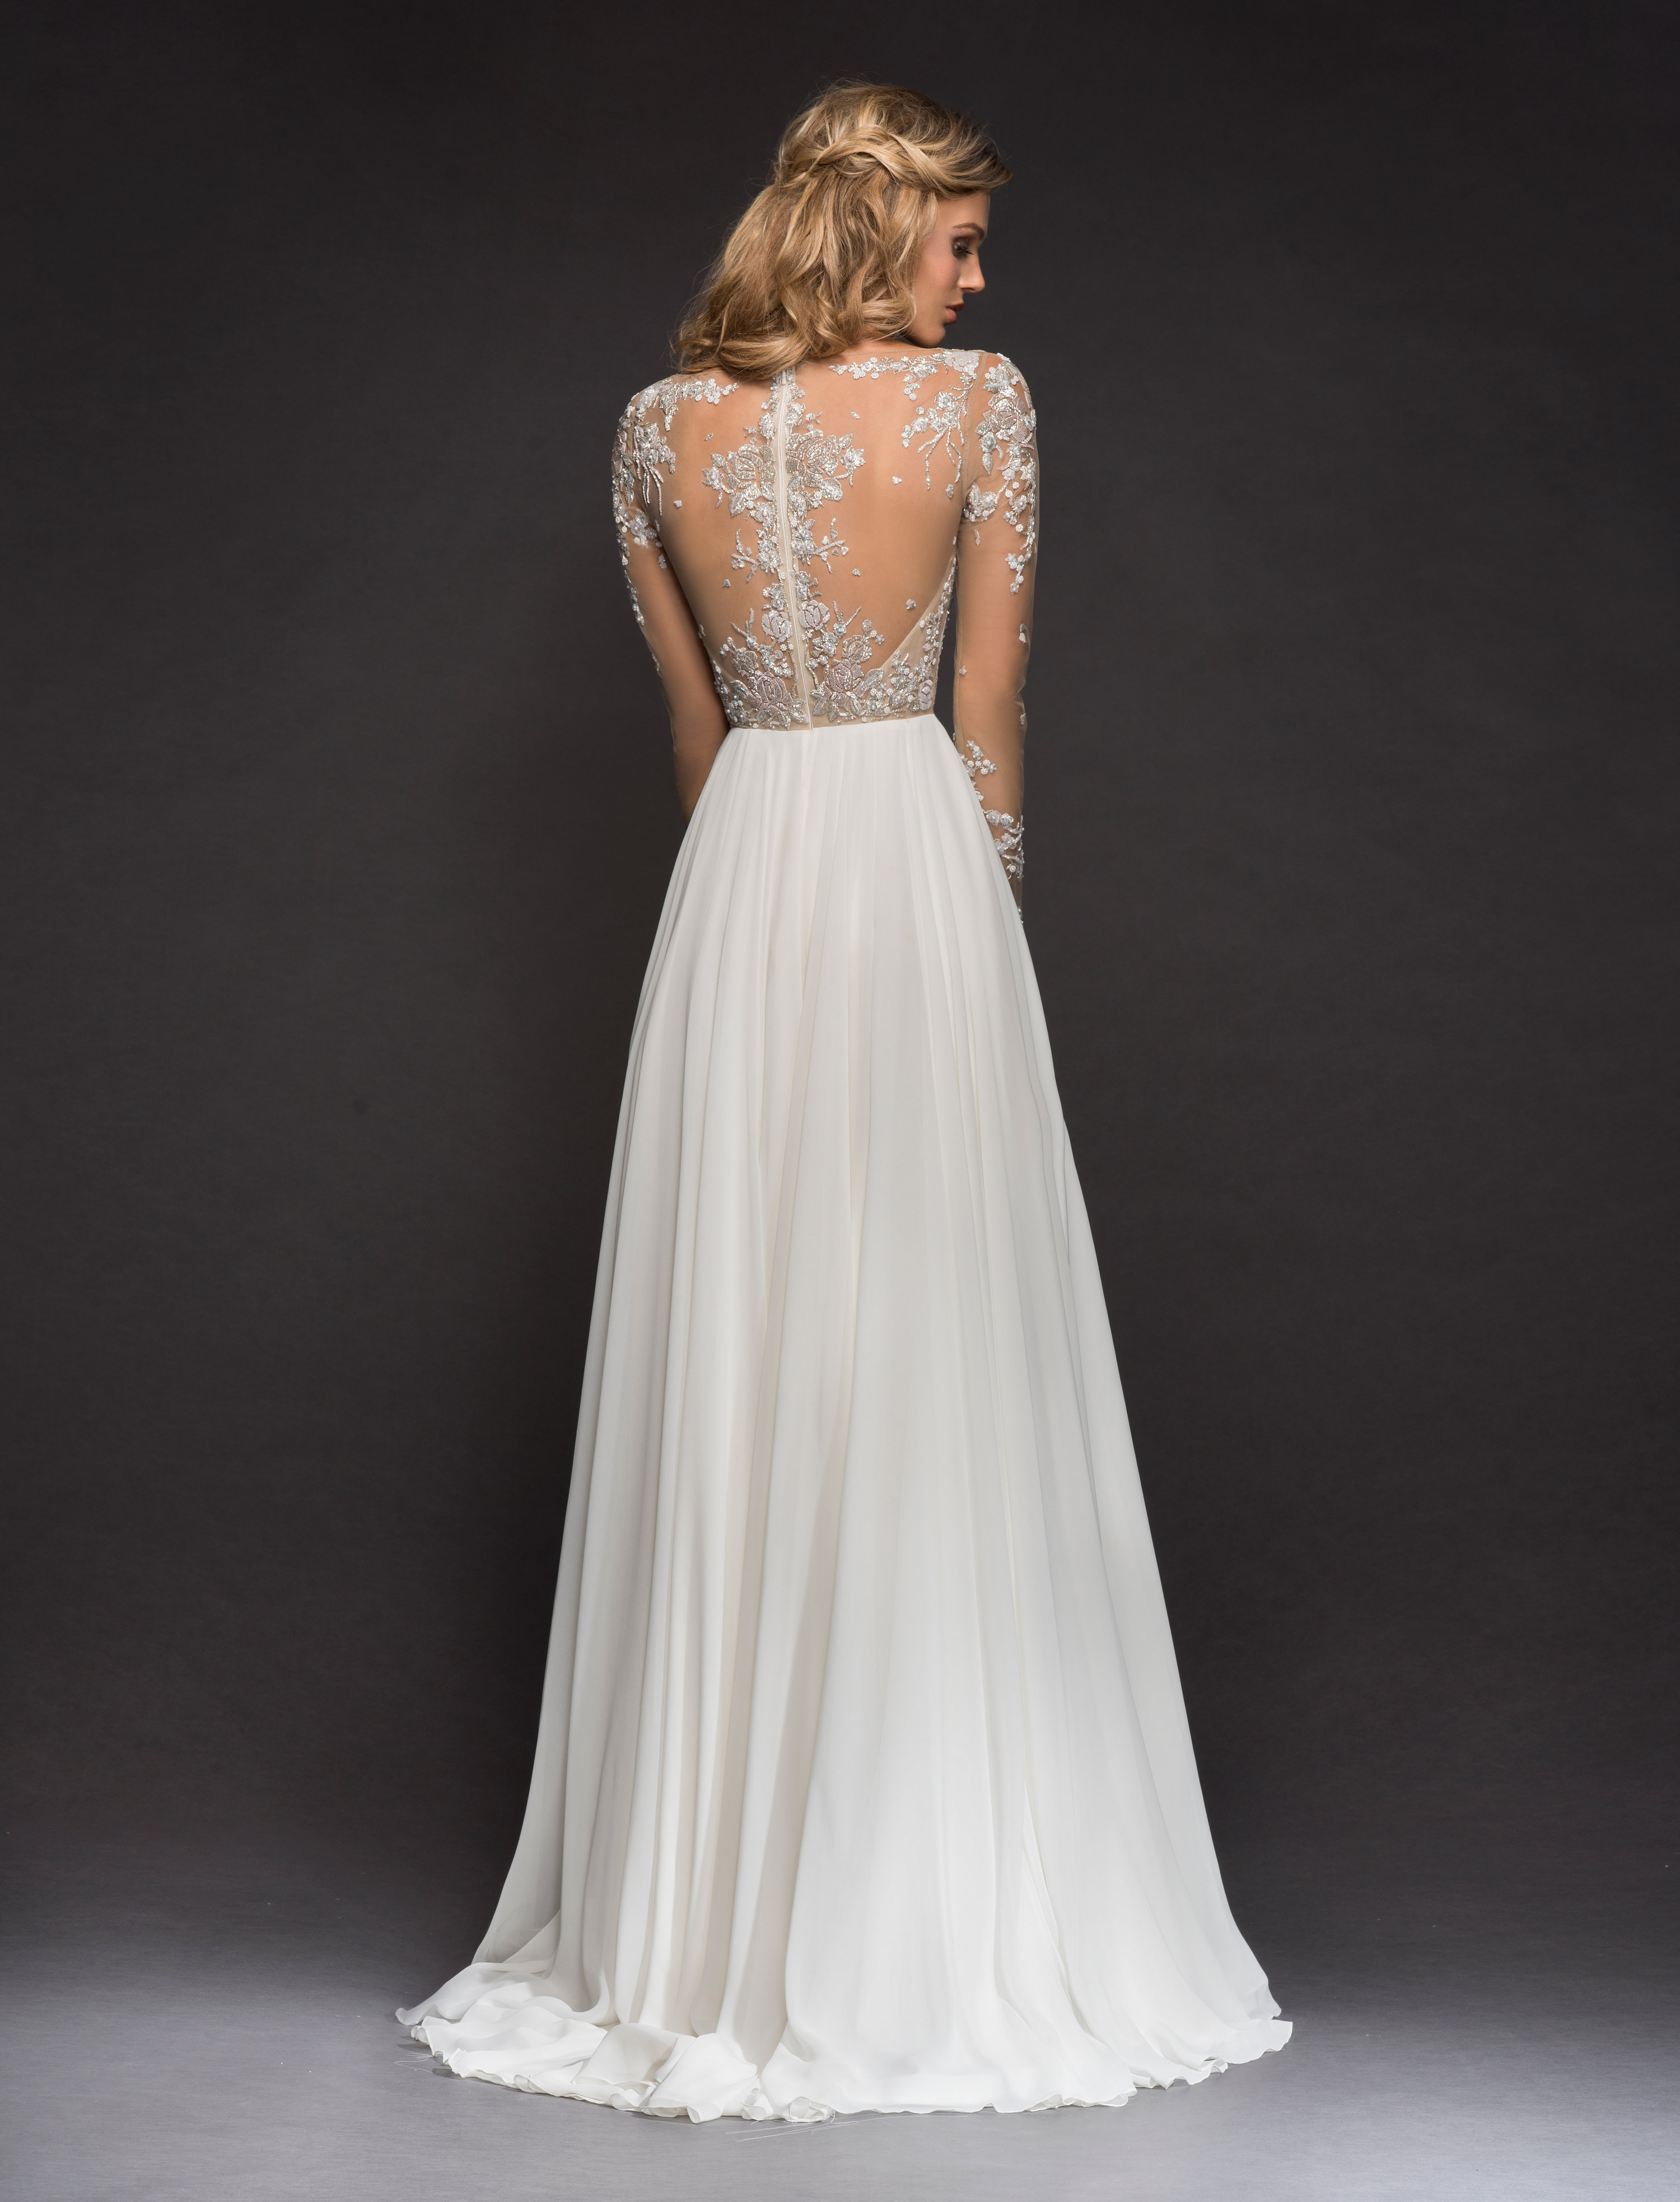 Long Sleeve Beaded Illusion Bodice A-line Wedding Dress | Kleinfeld ...